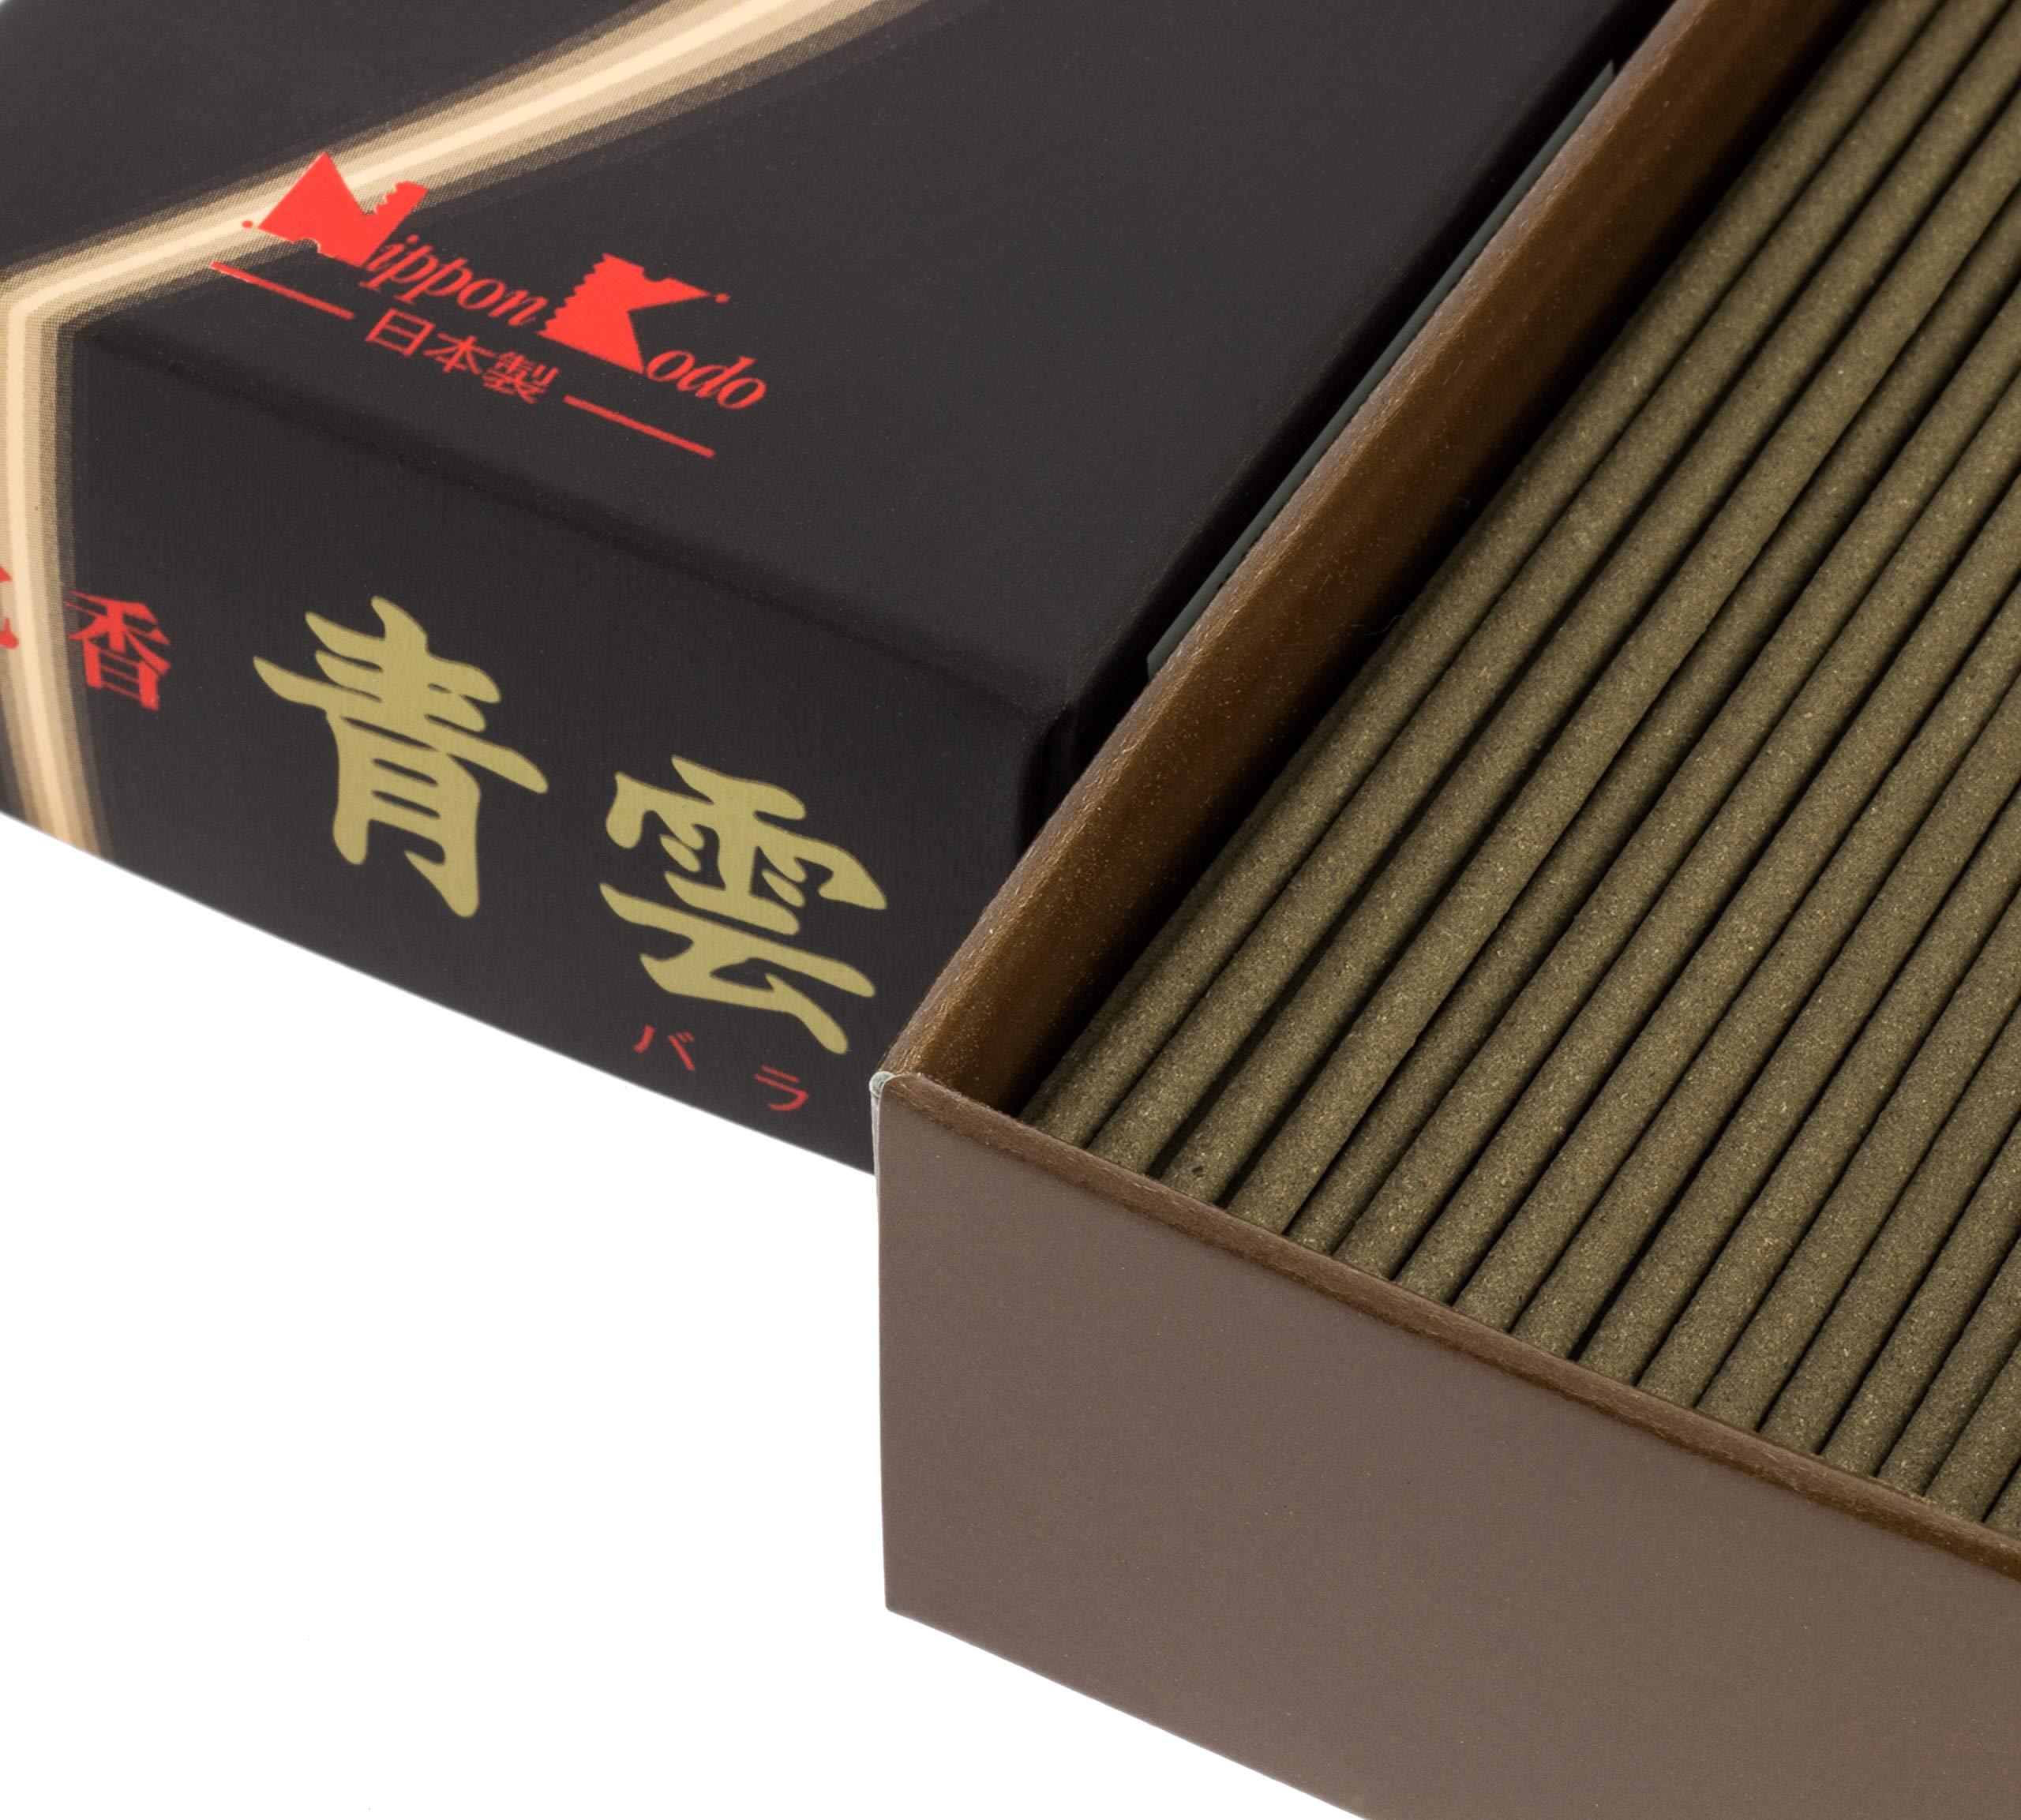 Nippon Kodo - Seiun - Jinkoh 170 sticks, wood by nippon kodo (Image #4)